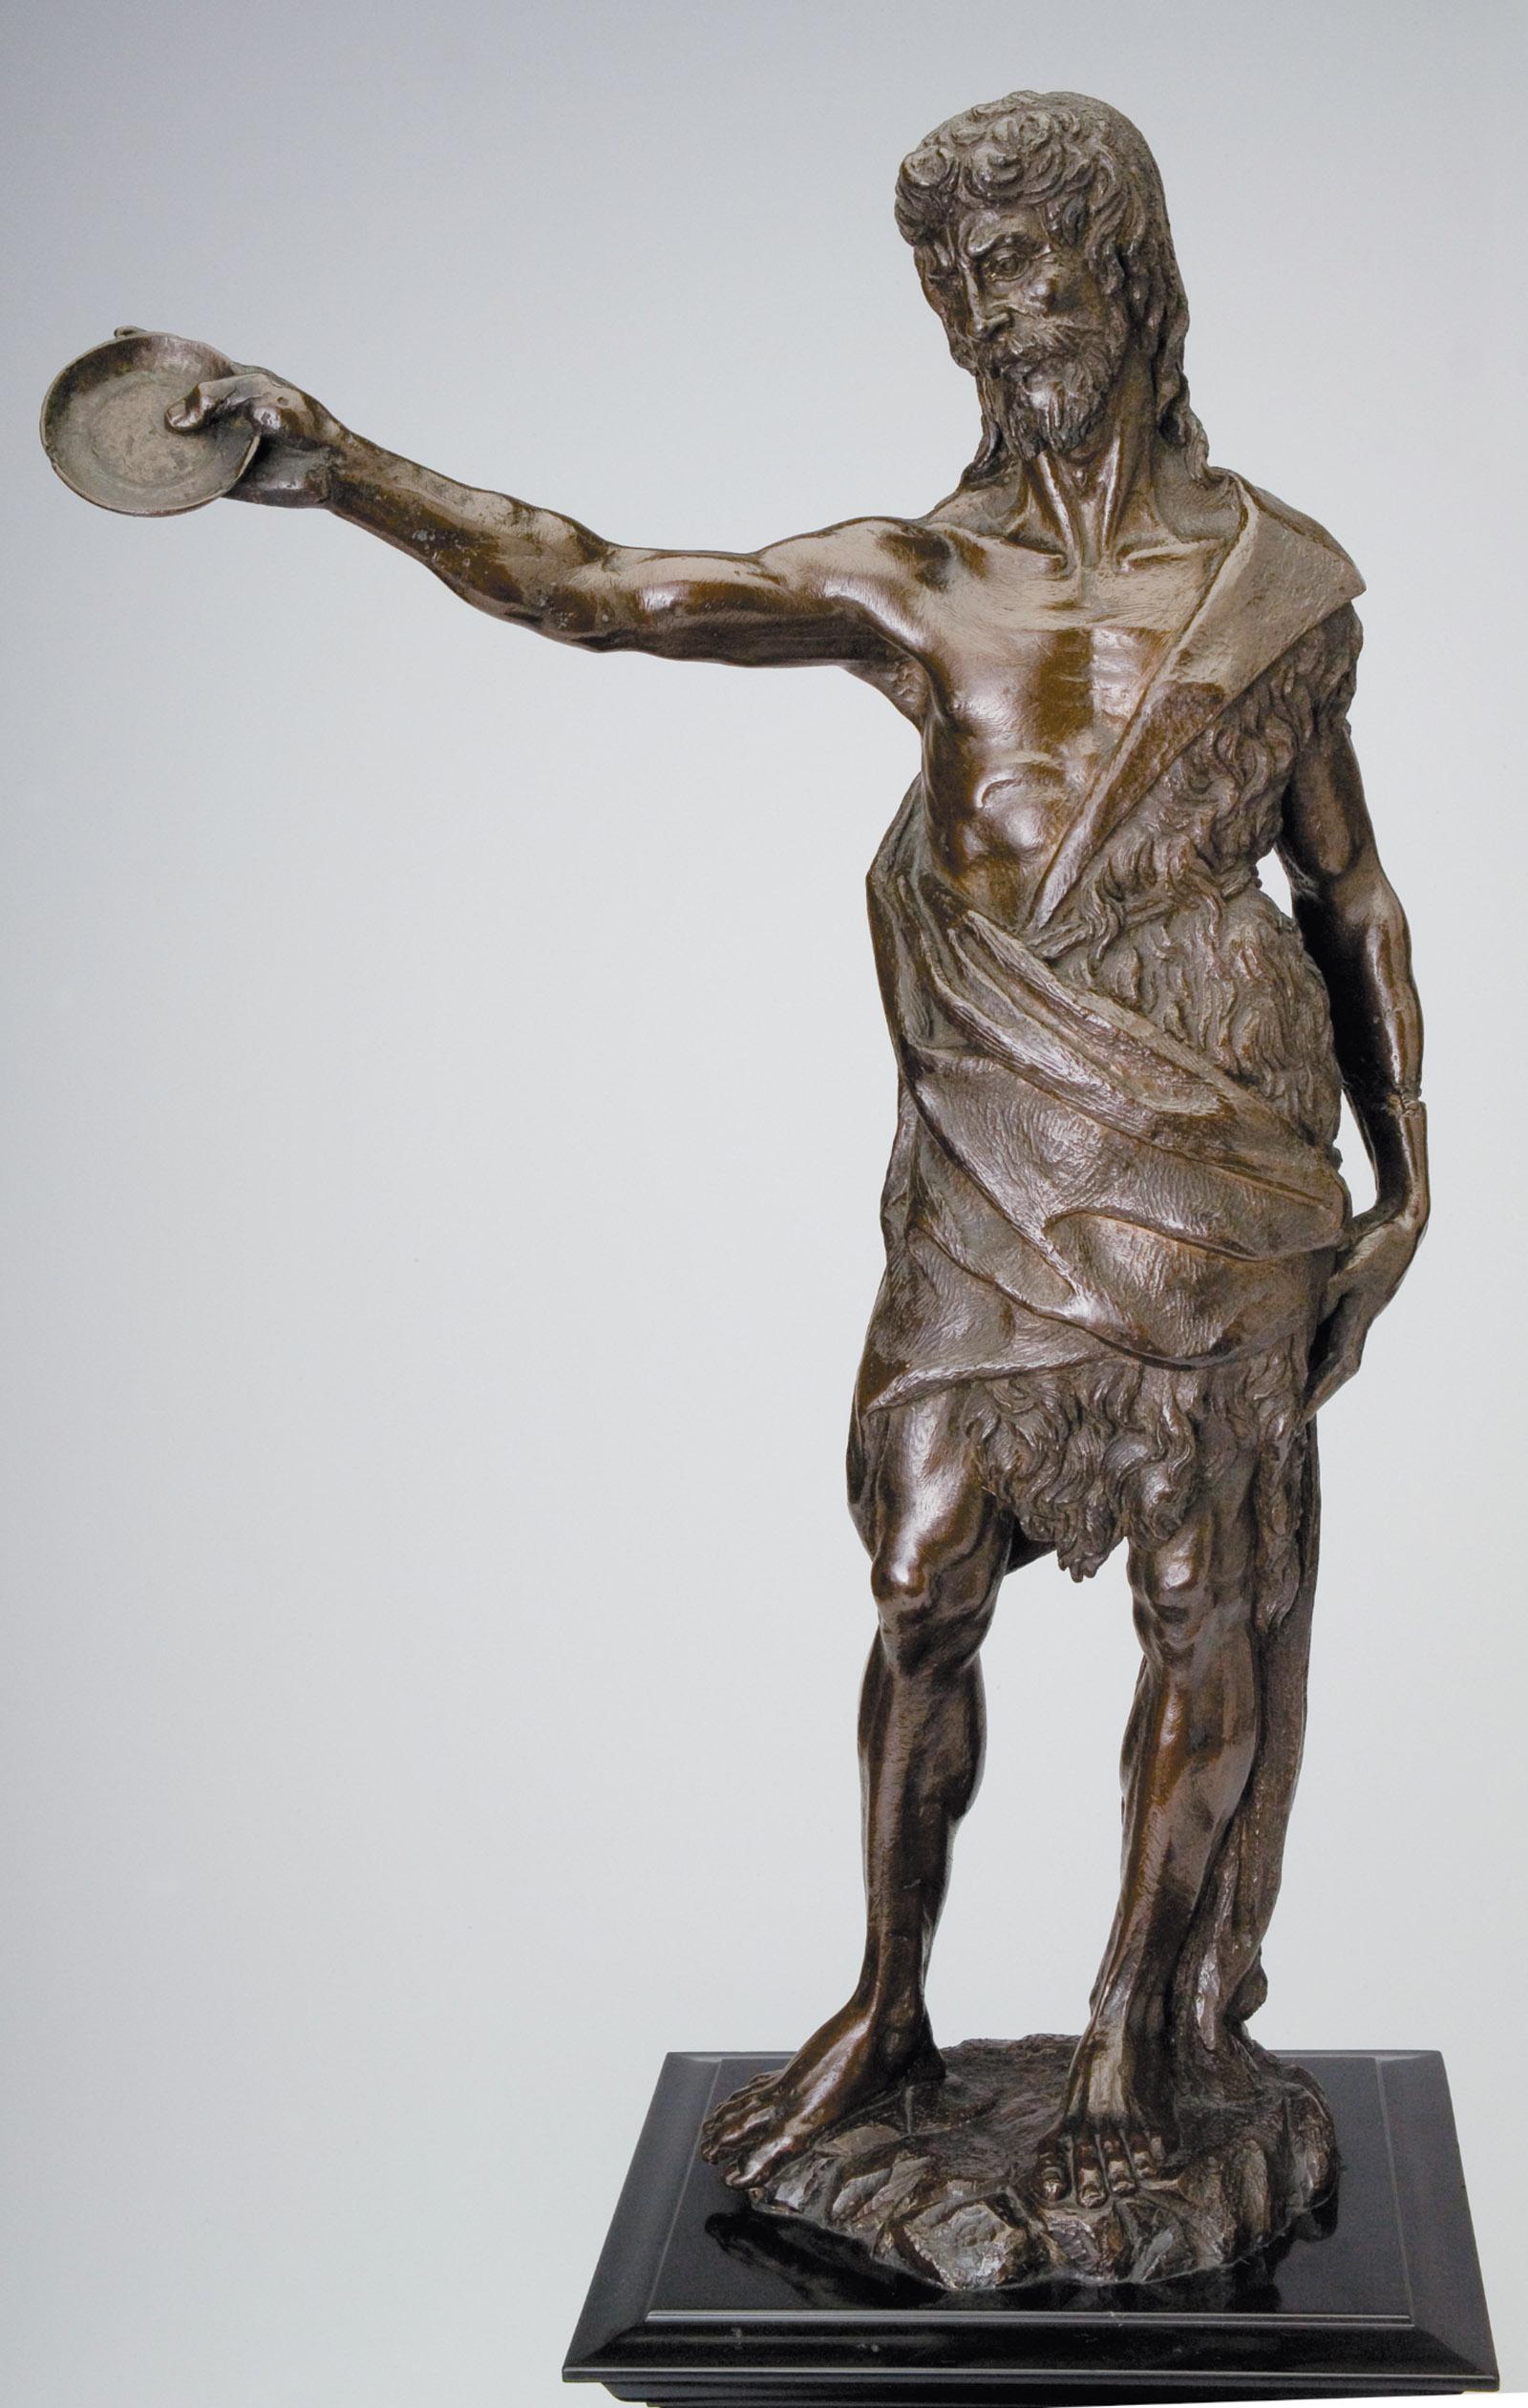 St. John Baptizing; statue by Francesco da Sangallo